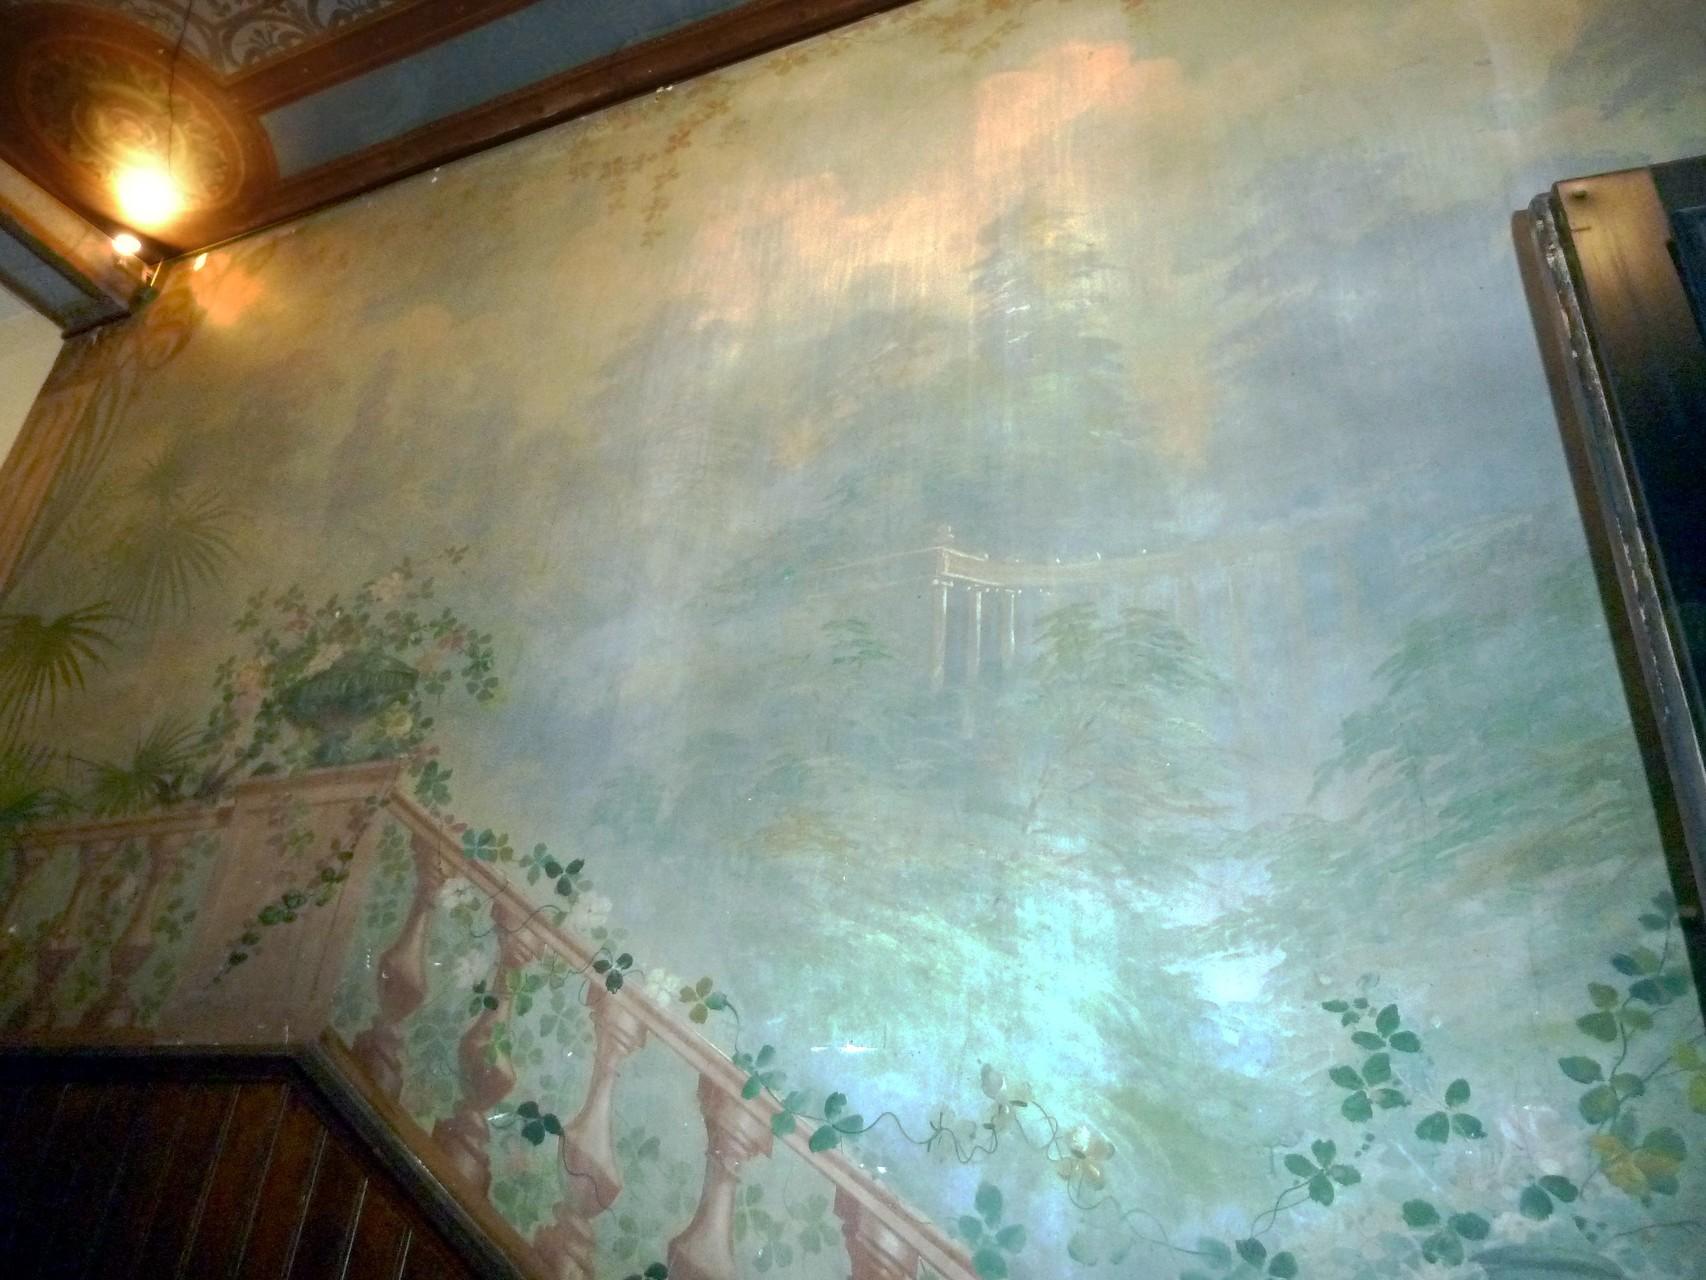 Peinture murale bd Matabiau